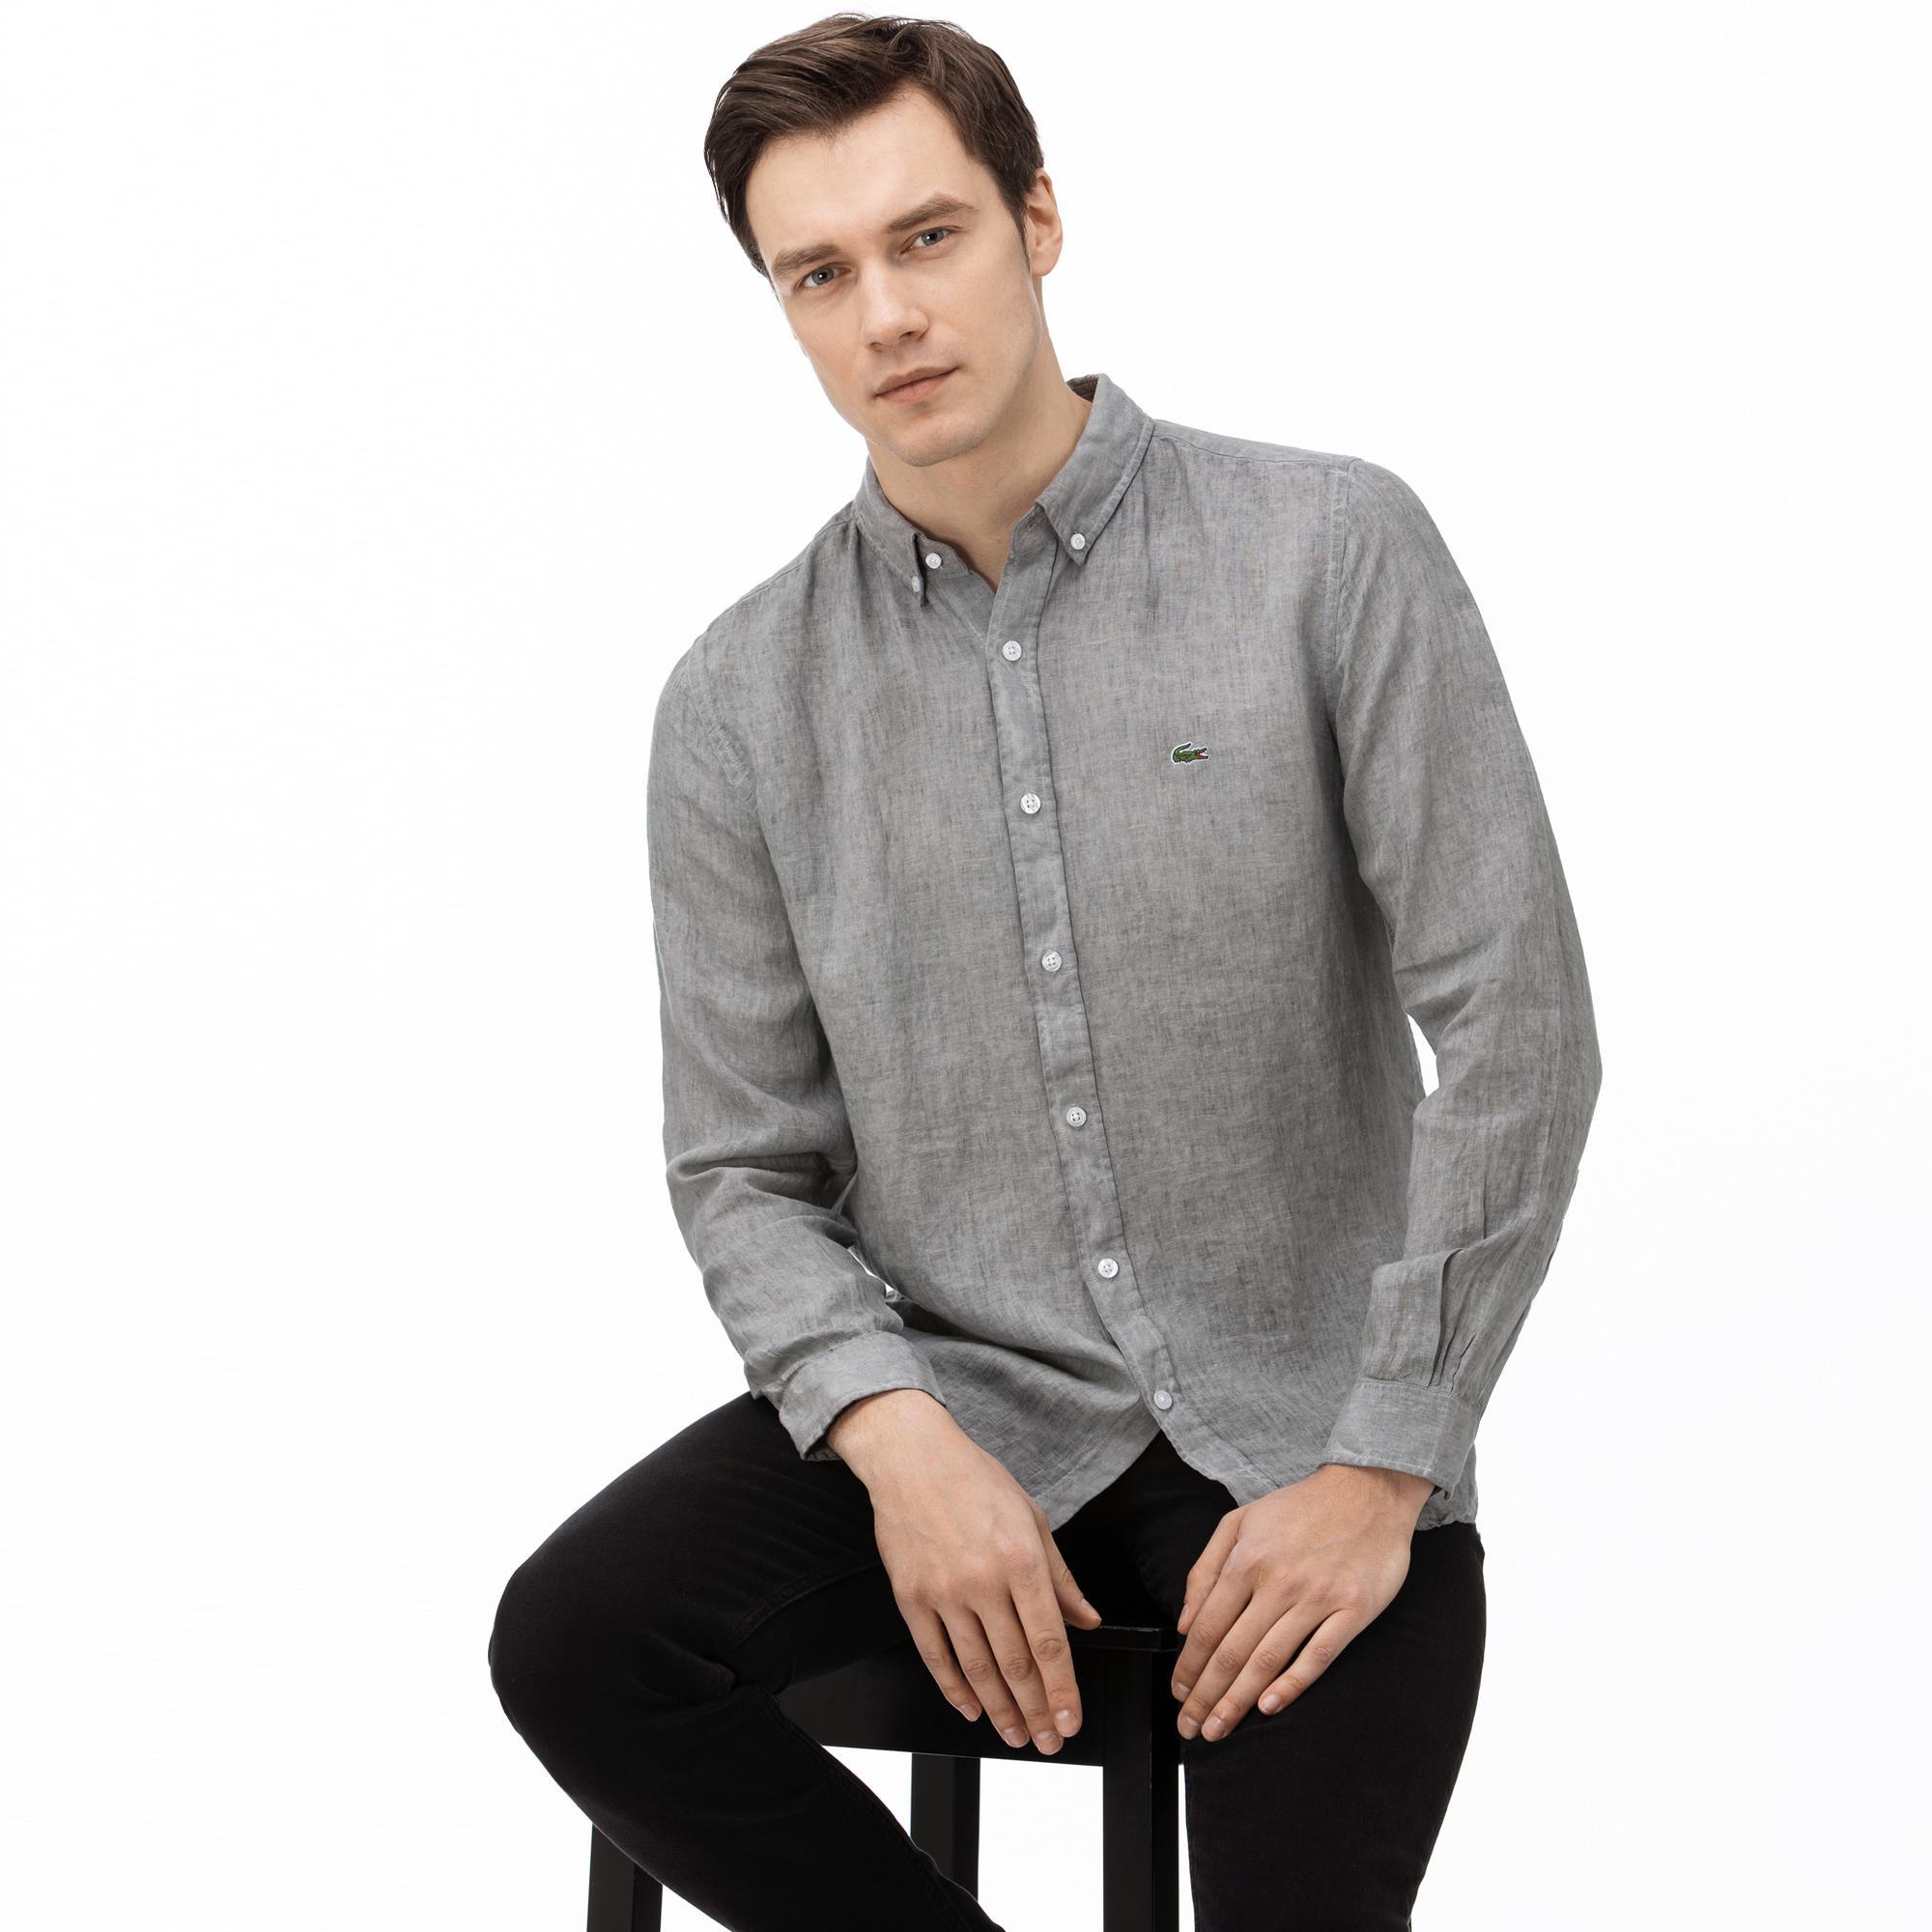 Lacoste Erkek Slim Fit Ekose Desenli Gri Keten Gömlek